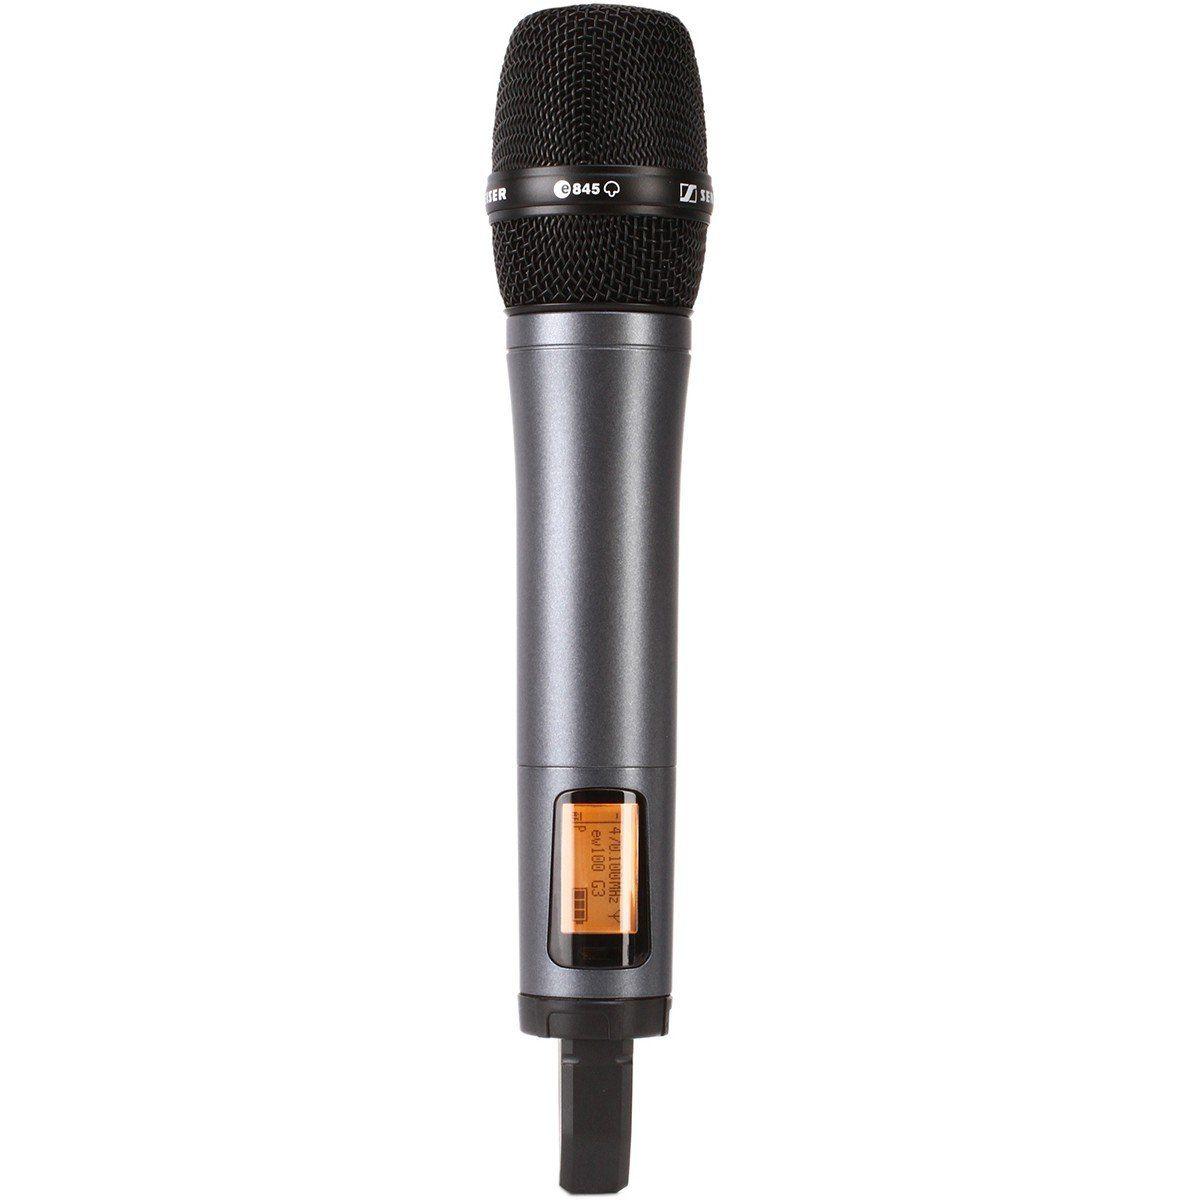 Sennheiser EW145 G3 Microfone Sem fio Sennheiser EW145-G3 para Performances em Palco